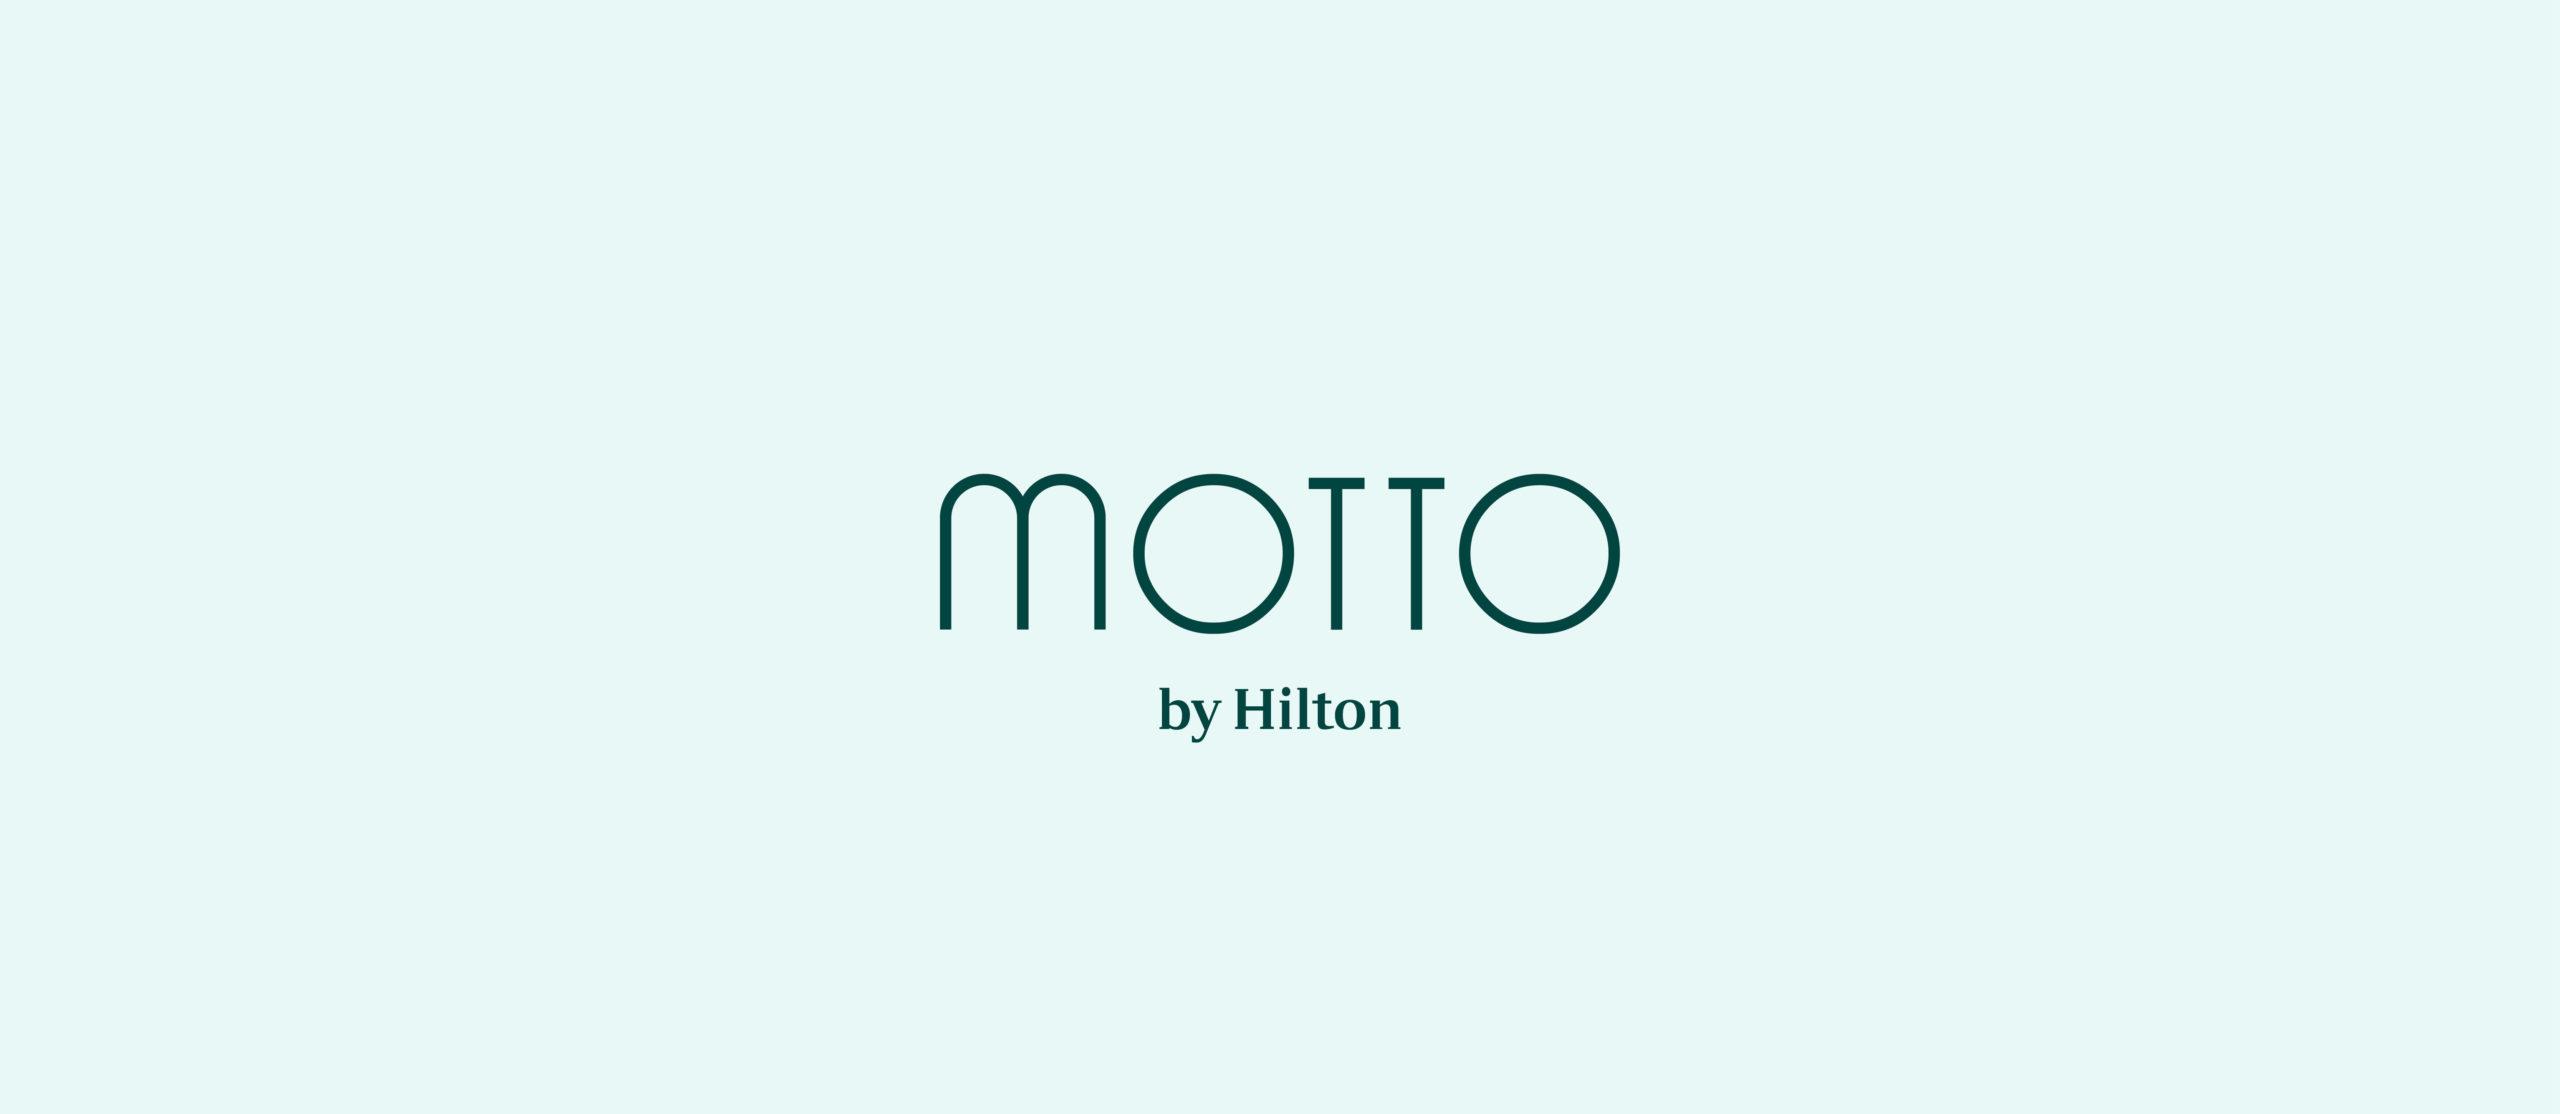 031919_Motto_Header